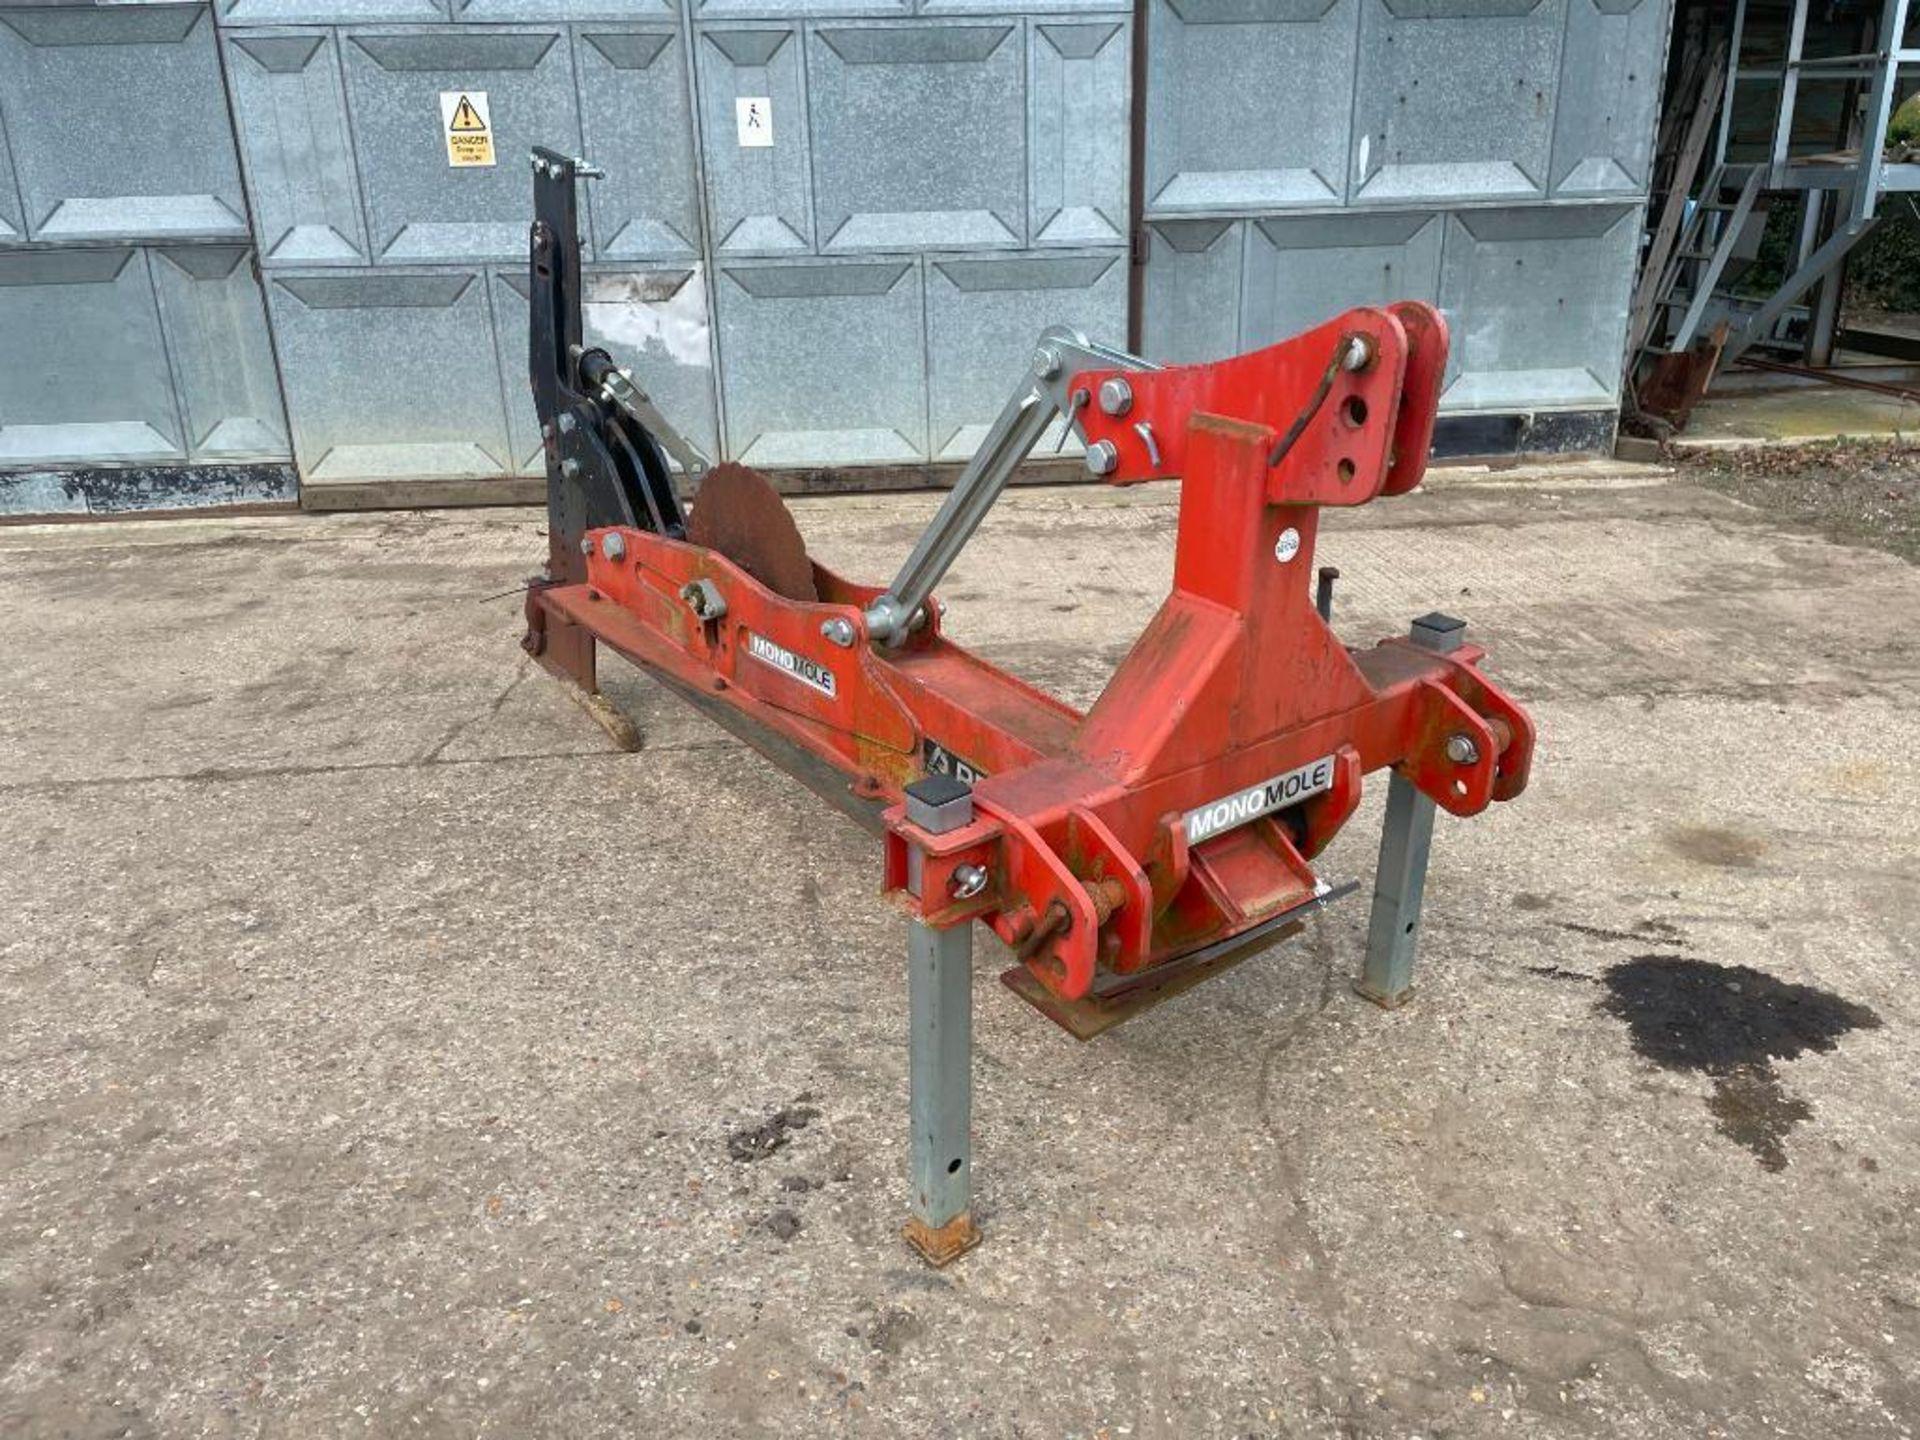 2013 Proforge Monomole single leg mole drainer. Serial No: 32757 - Image 2 of 8